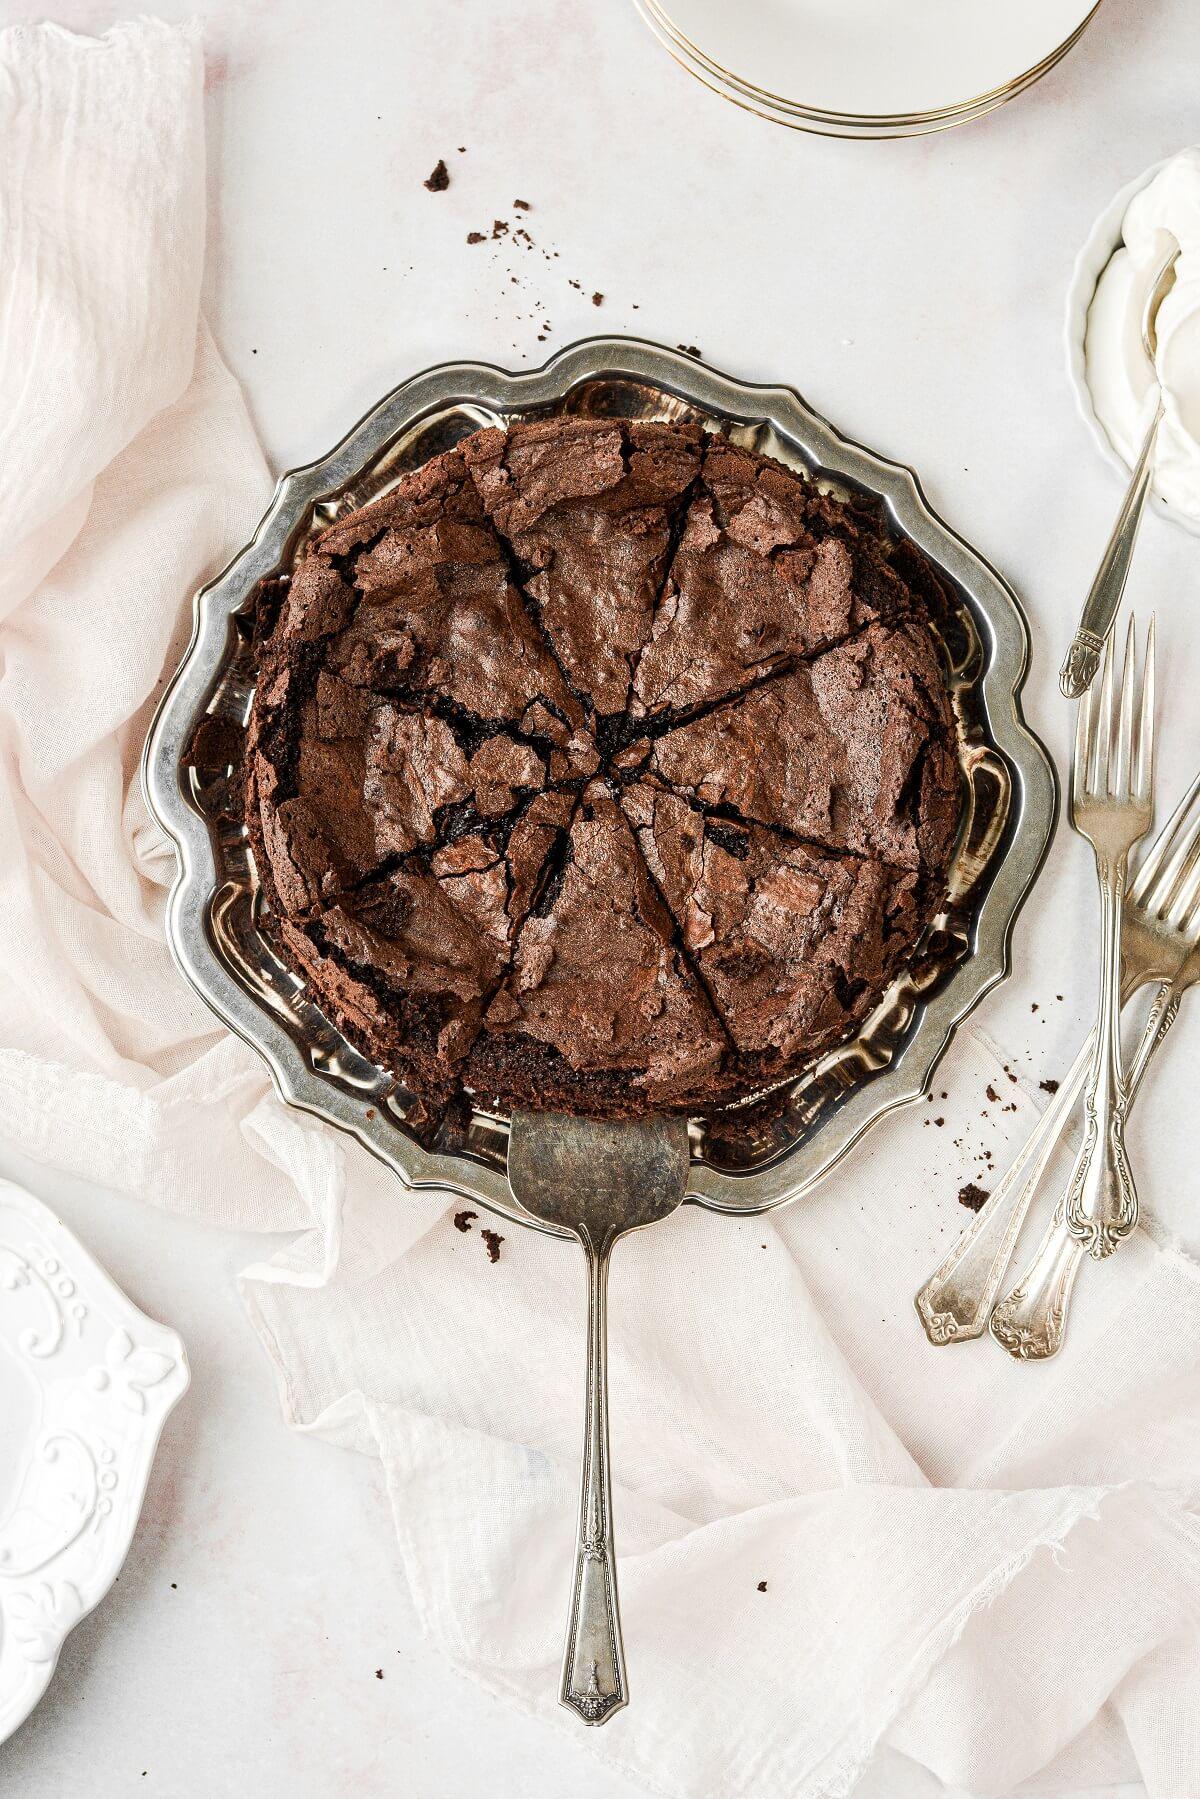 Flourless chocolate cake cut into 8 slices.